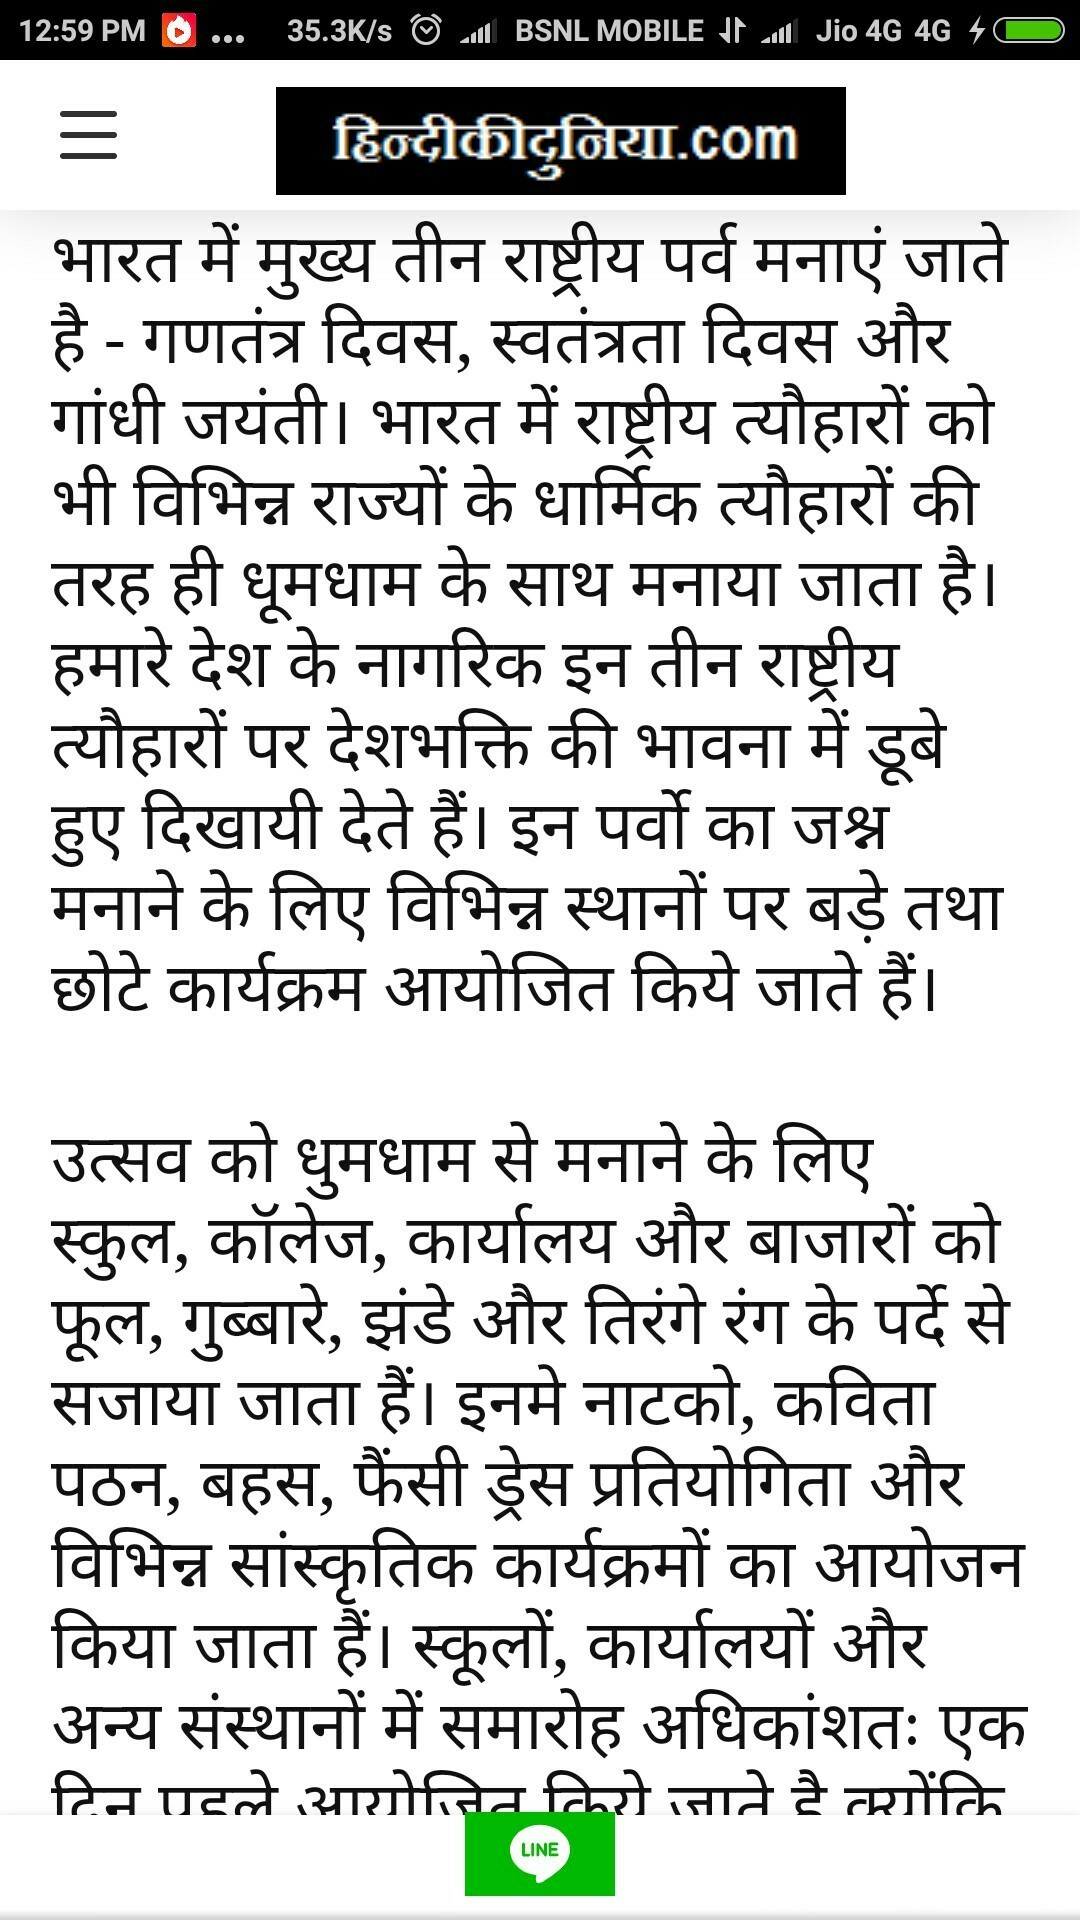 Rashtriya parv essay in hindi dissertation fellowships science engineering